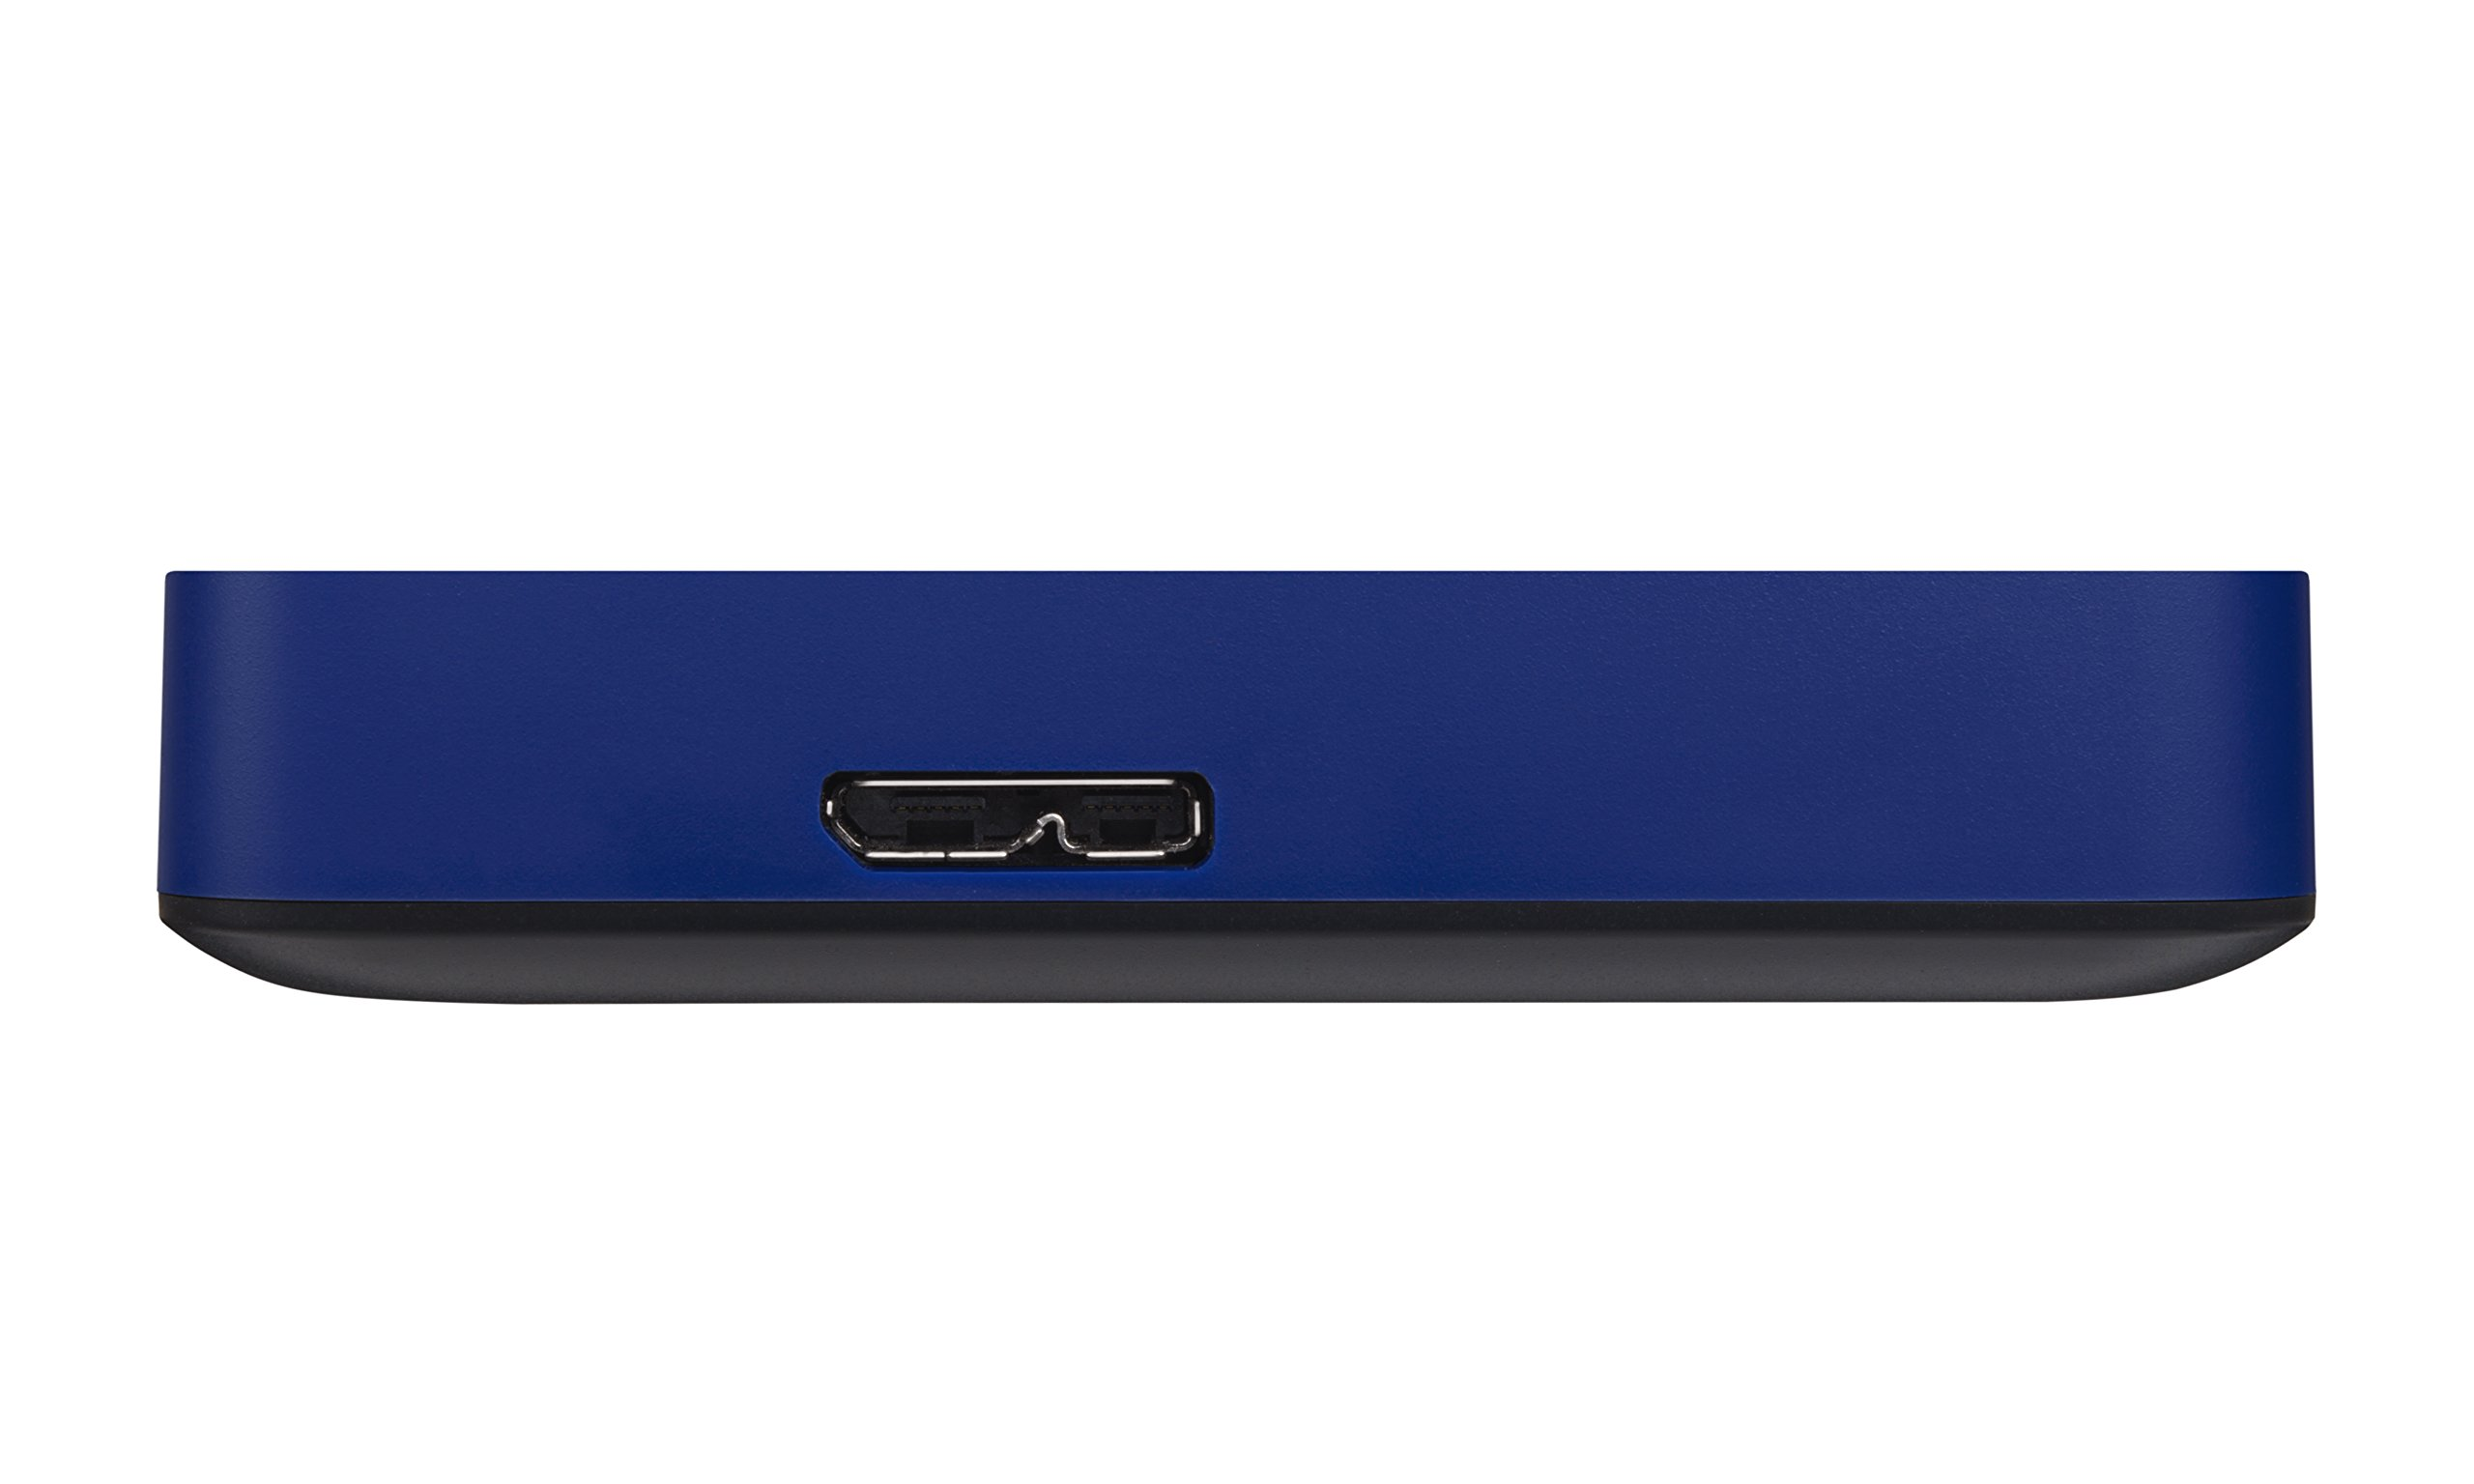 Toshiba Canvio Advance 4TB Portable External Hard Drive USB 3.0, Blue (HDTC940XL3CA) by Toshiba (Image #5)